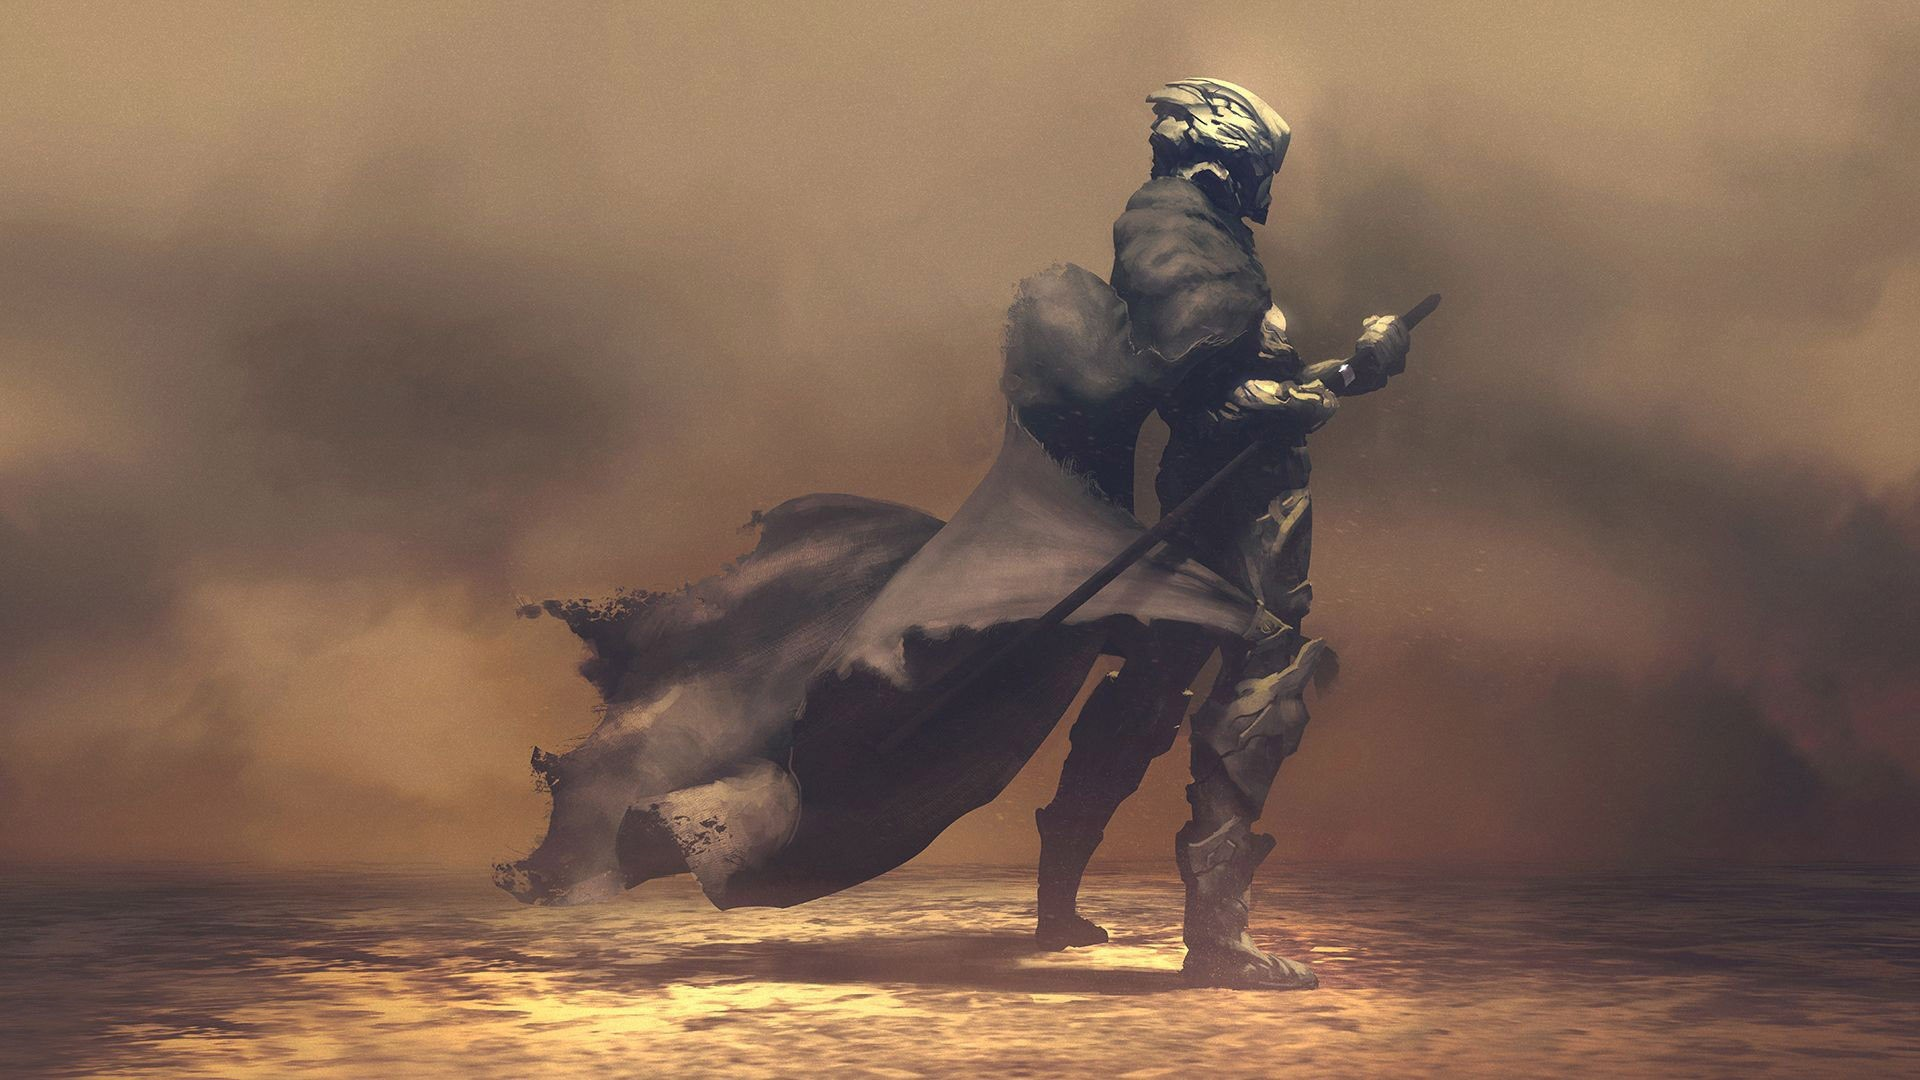 Star Wars Samurai Wallpaper Posted By Ryan Tremblay